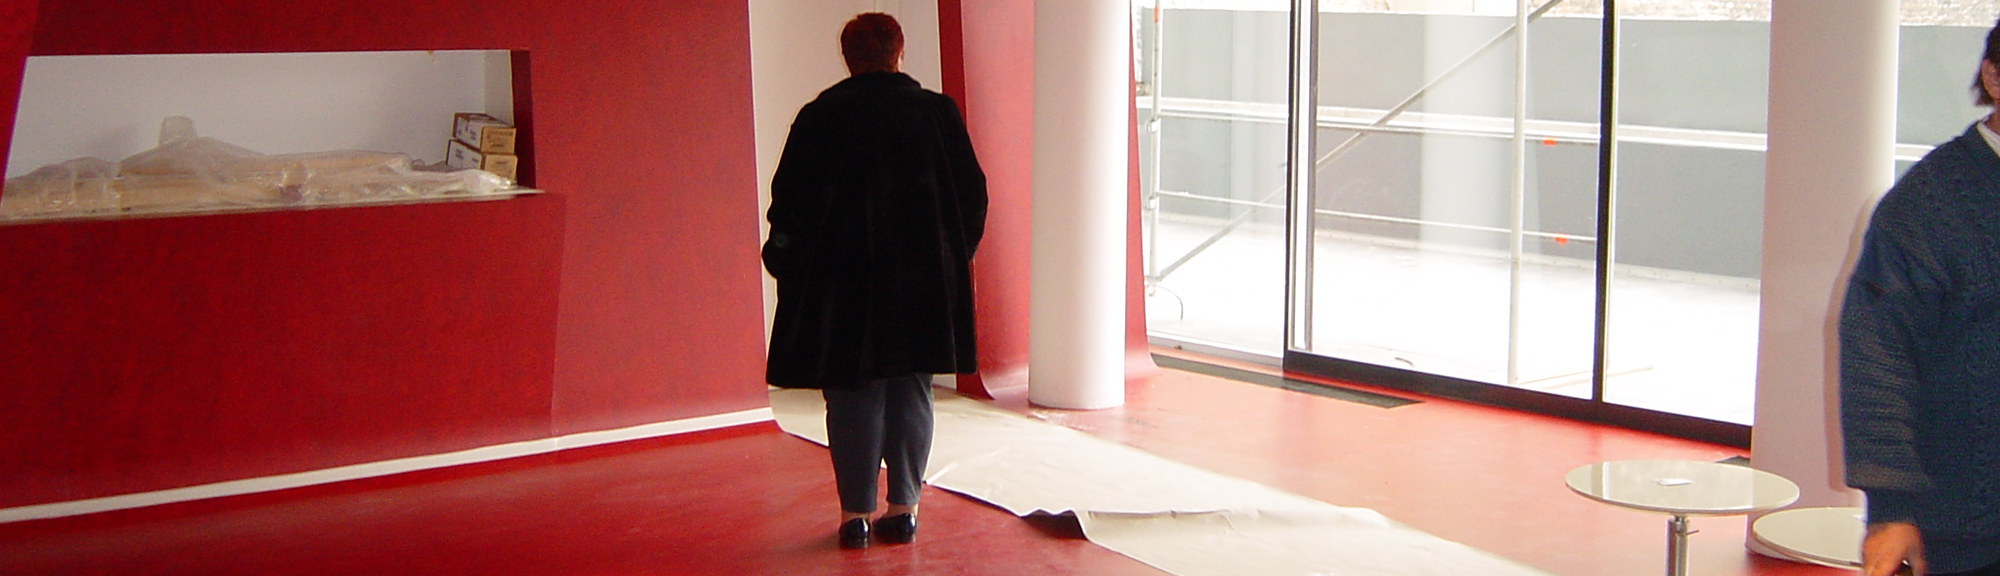 Linoleum designhotel q ks bodenbelagsarbeiten gmbh for Designhotel q